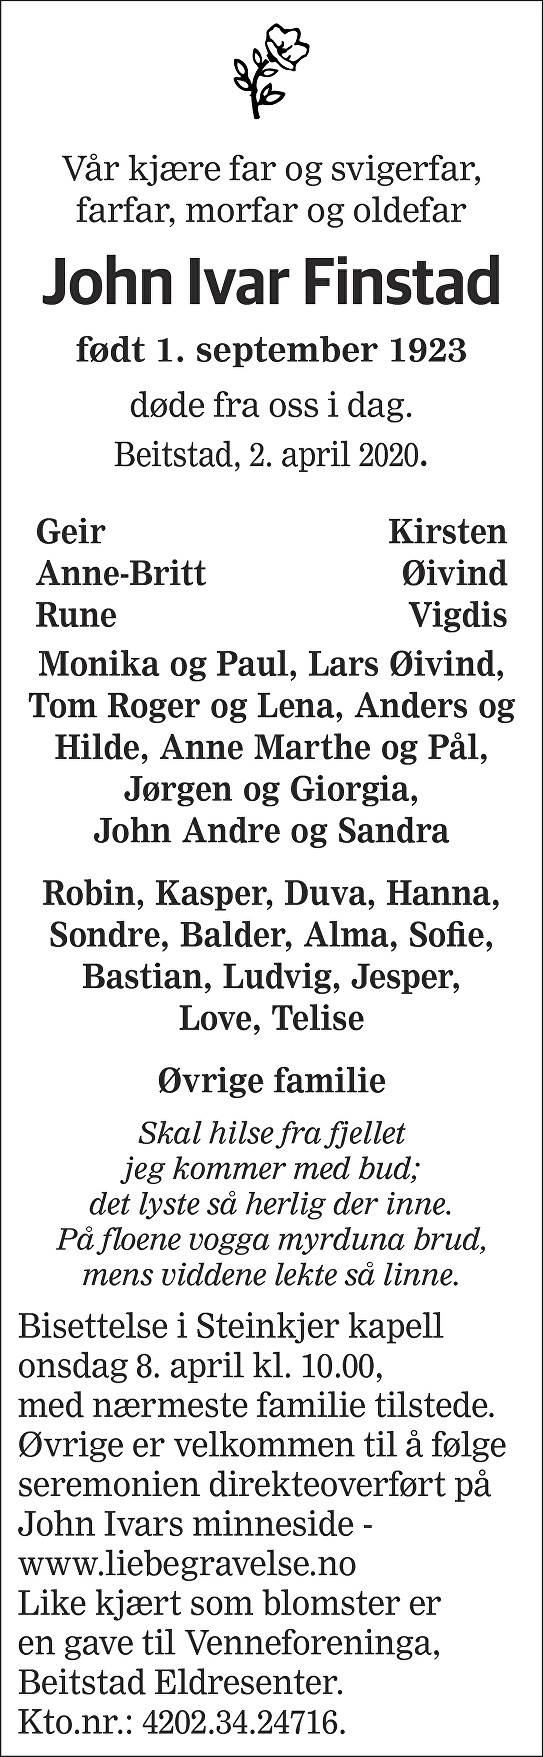 John Ivar Finstad Dødsannonse